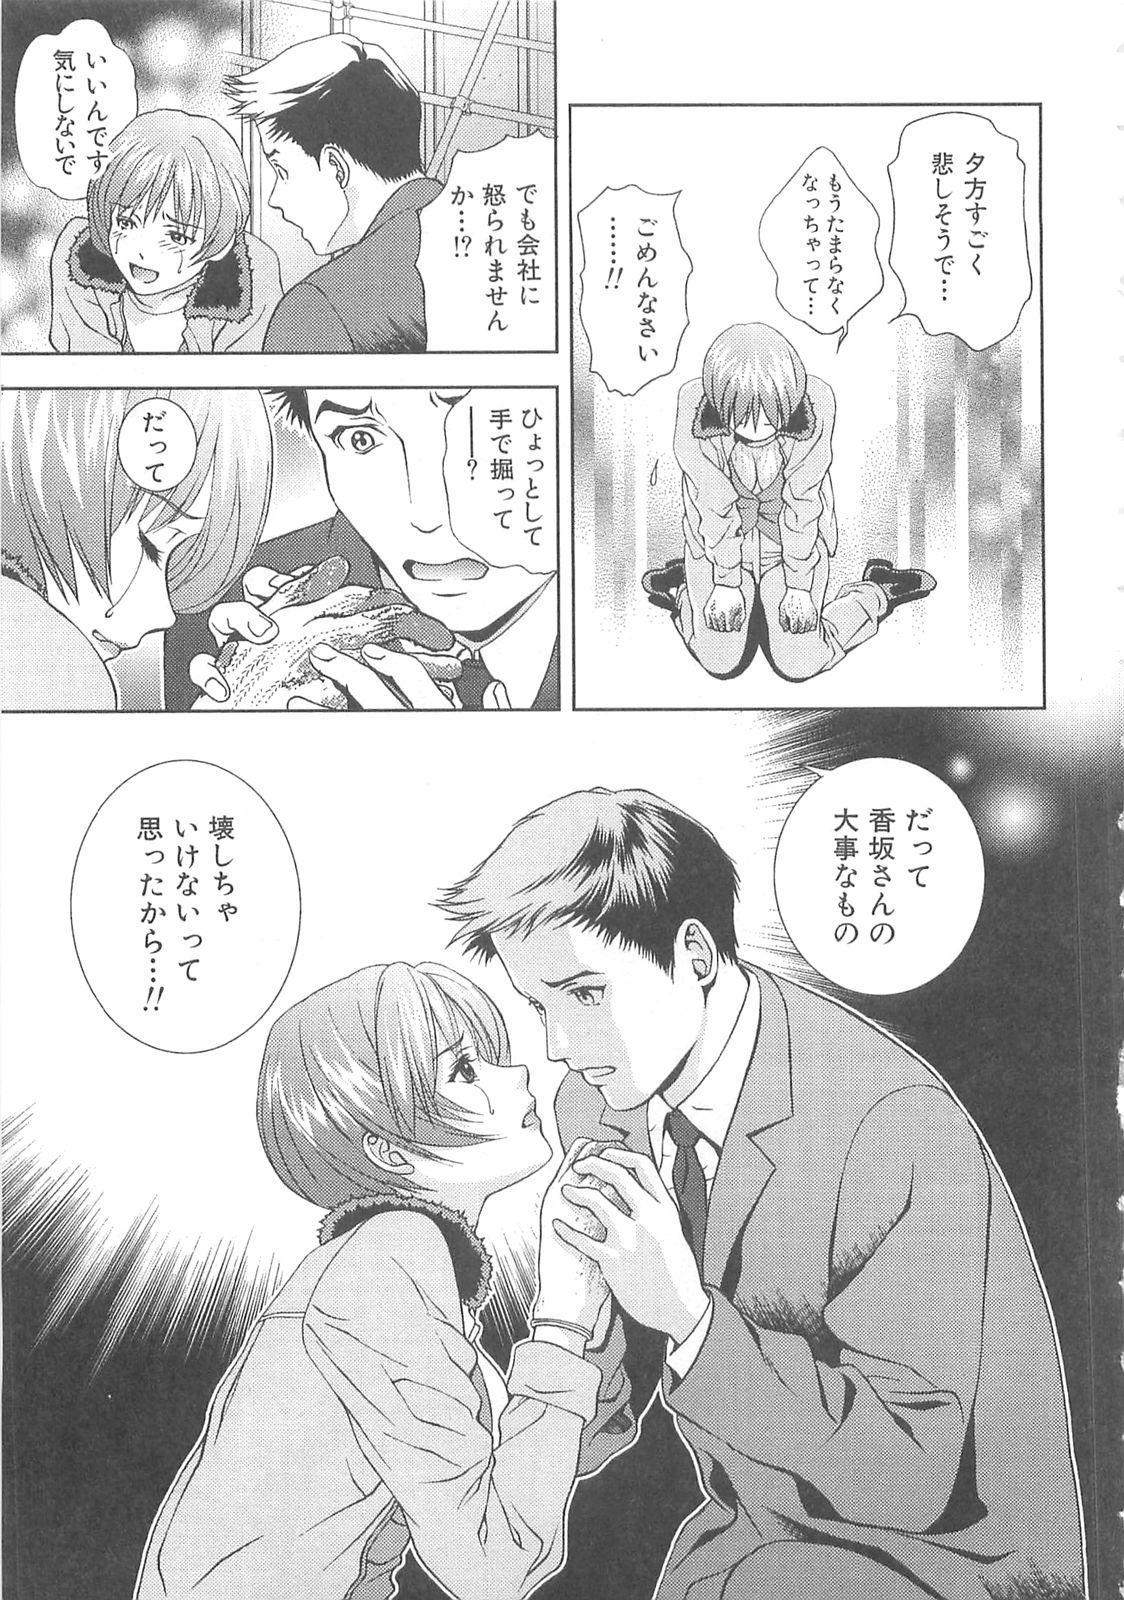 Tenshi no Kyuu - Angel's Pretty Hip 151